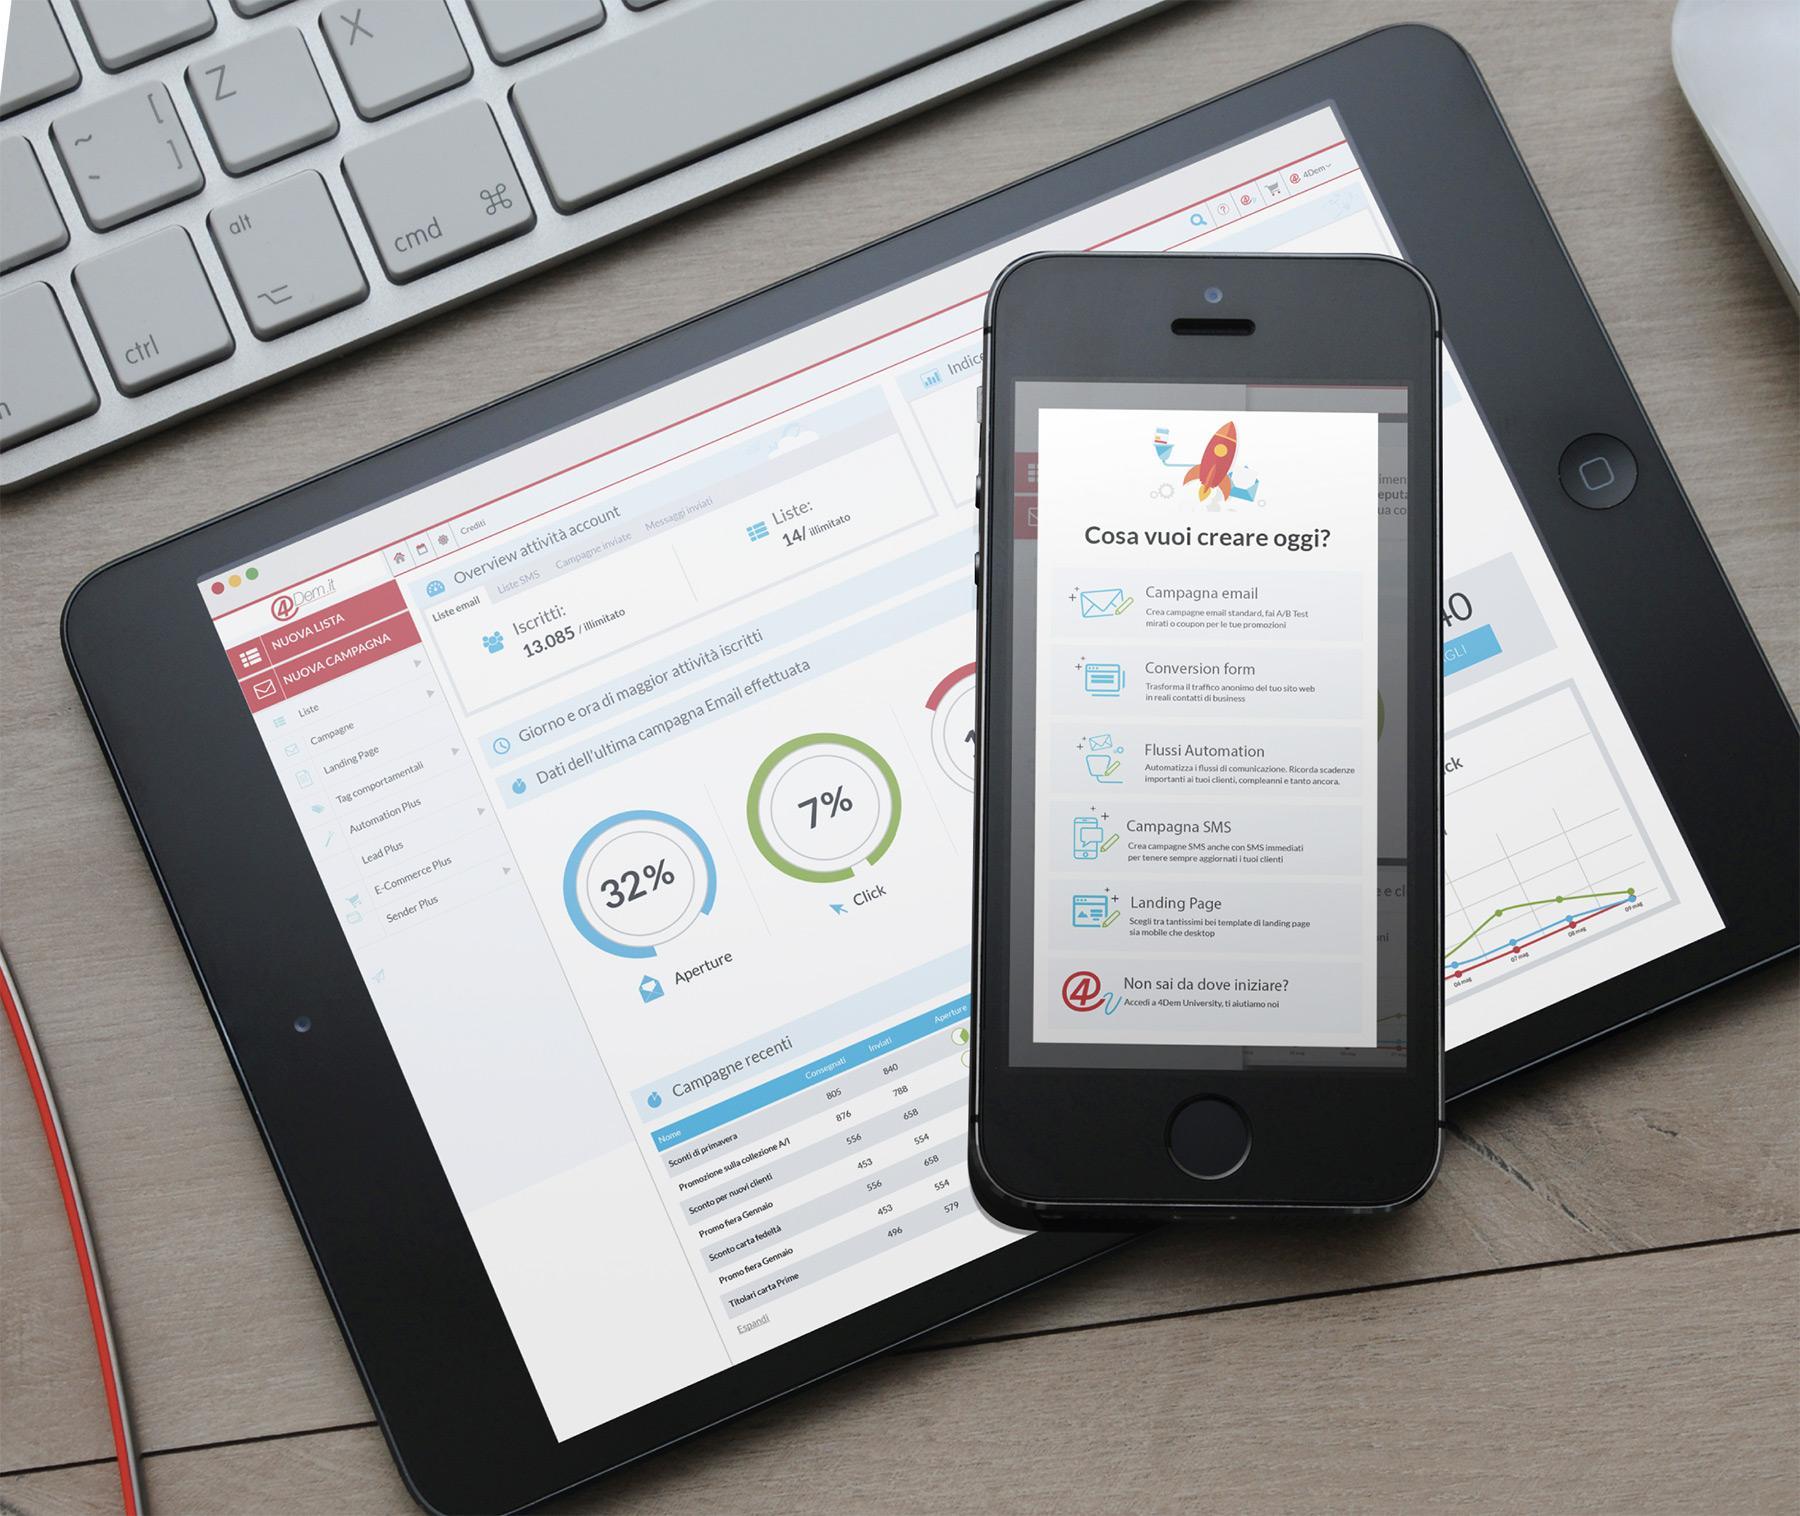 Recensioni 4Dem.it: La piattaforma per Email ed SMS Marketing 100% Italiana - appvizer